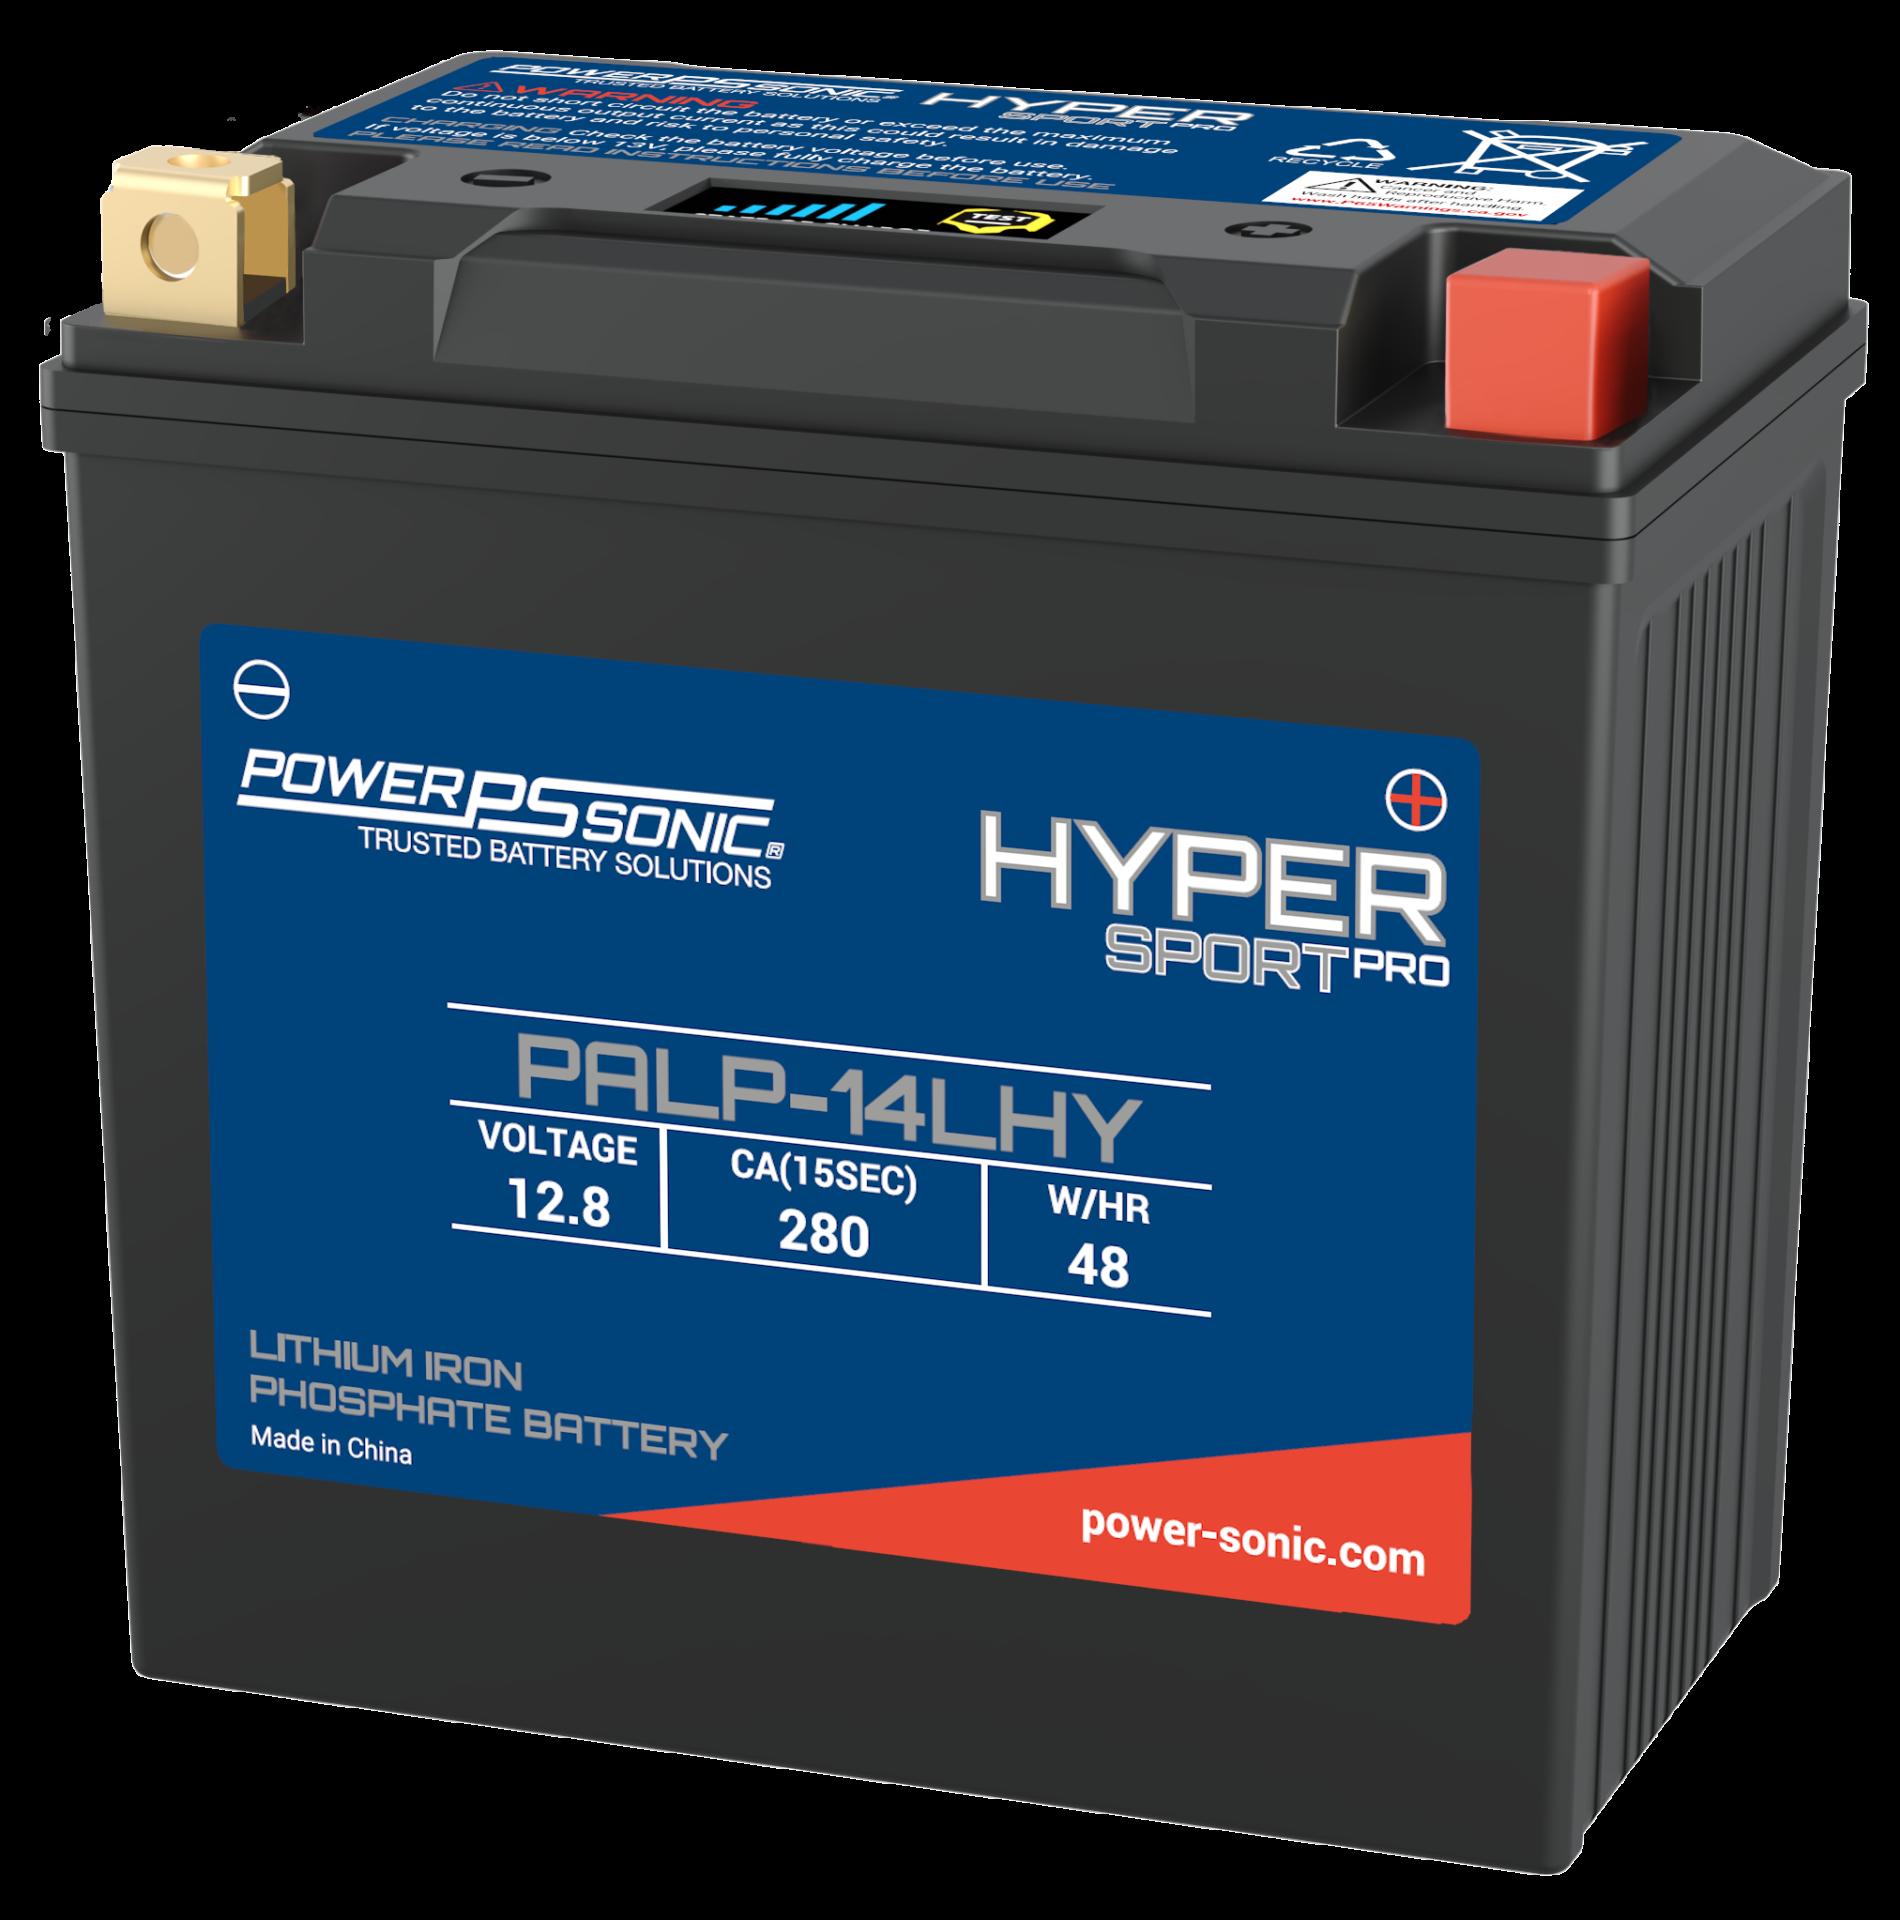 PALP-14LHY - Lithium powersport battery